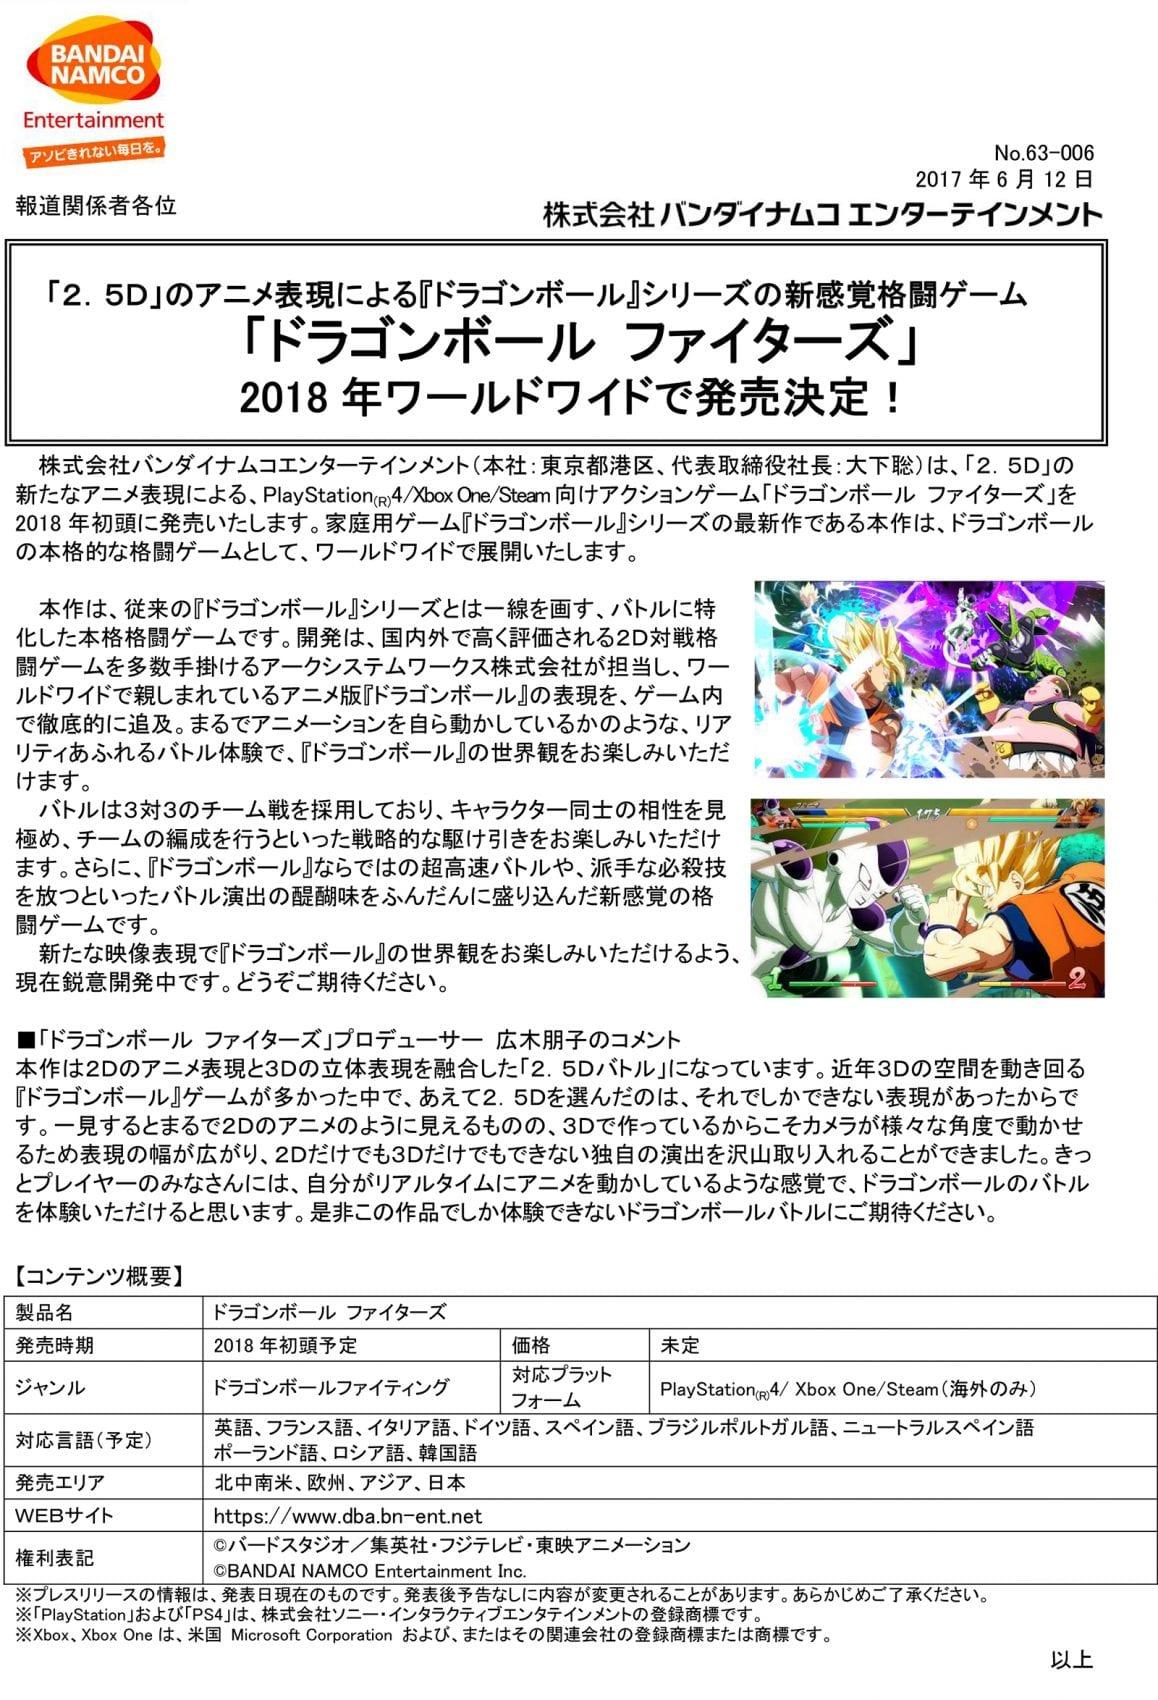 Microsoft Word - アテナ_170609_最終版_HP.doc